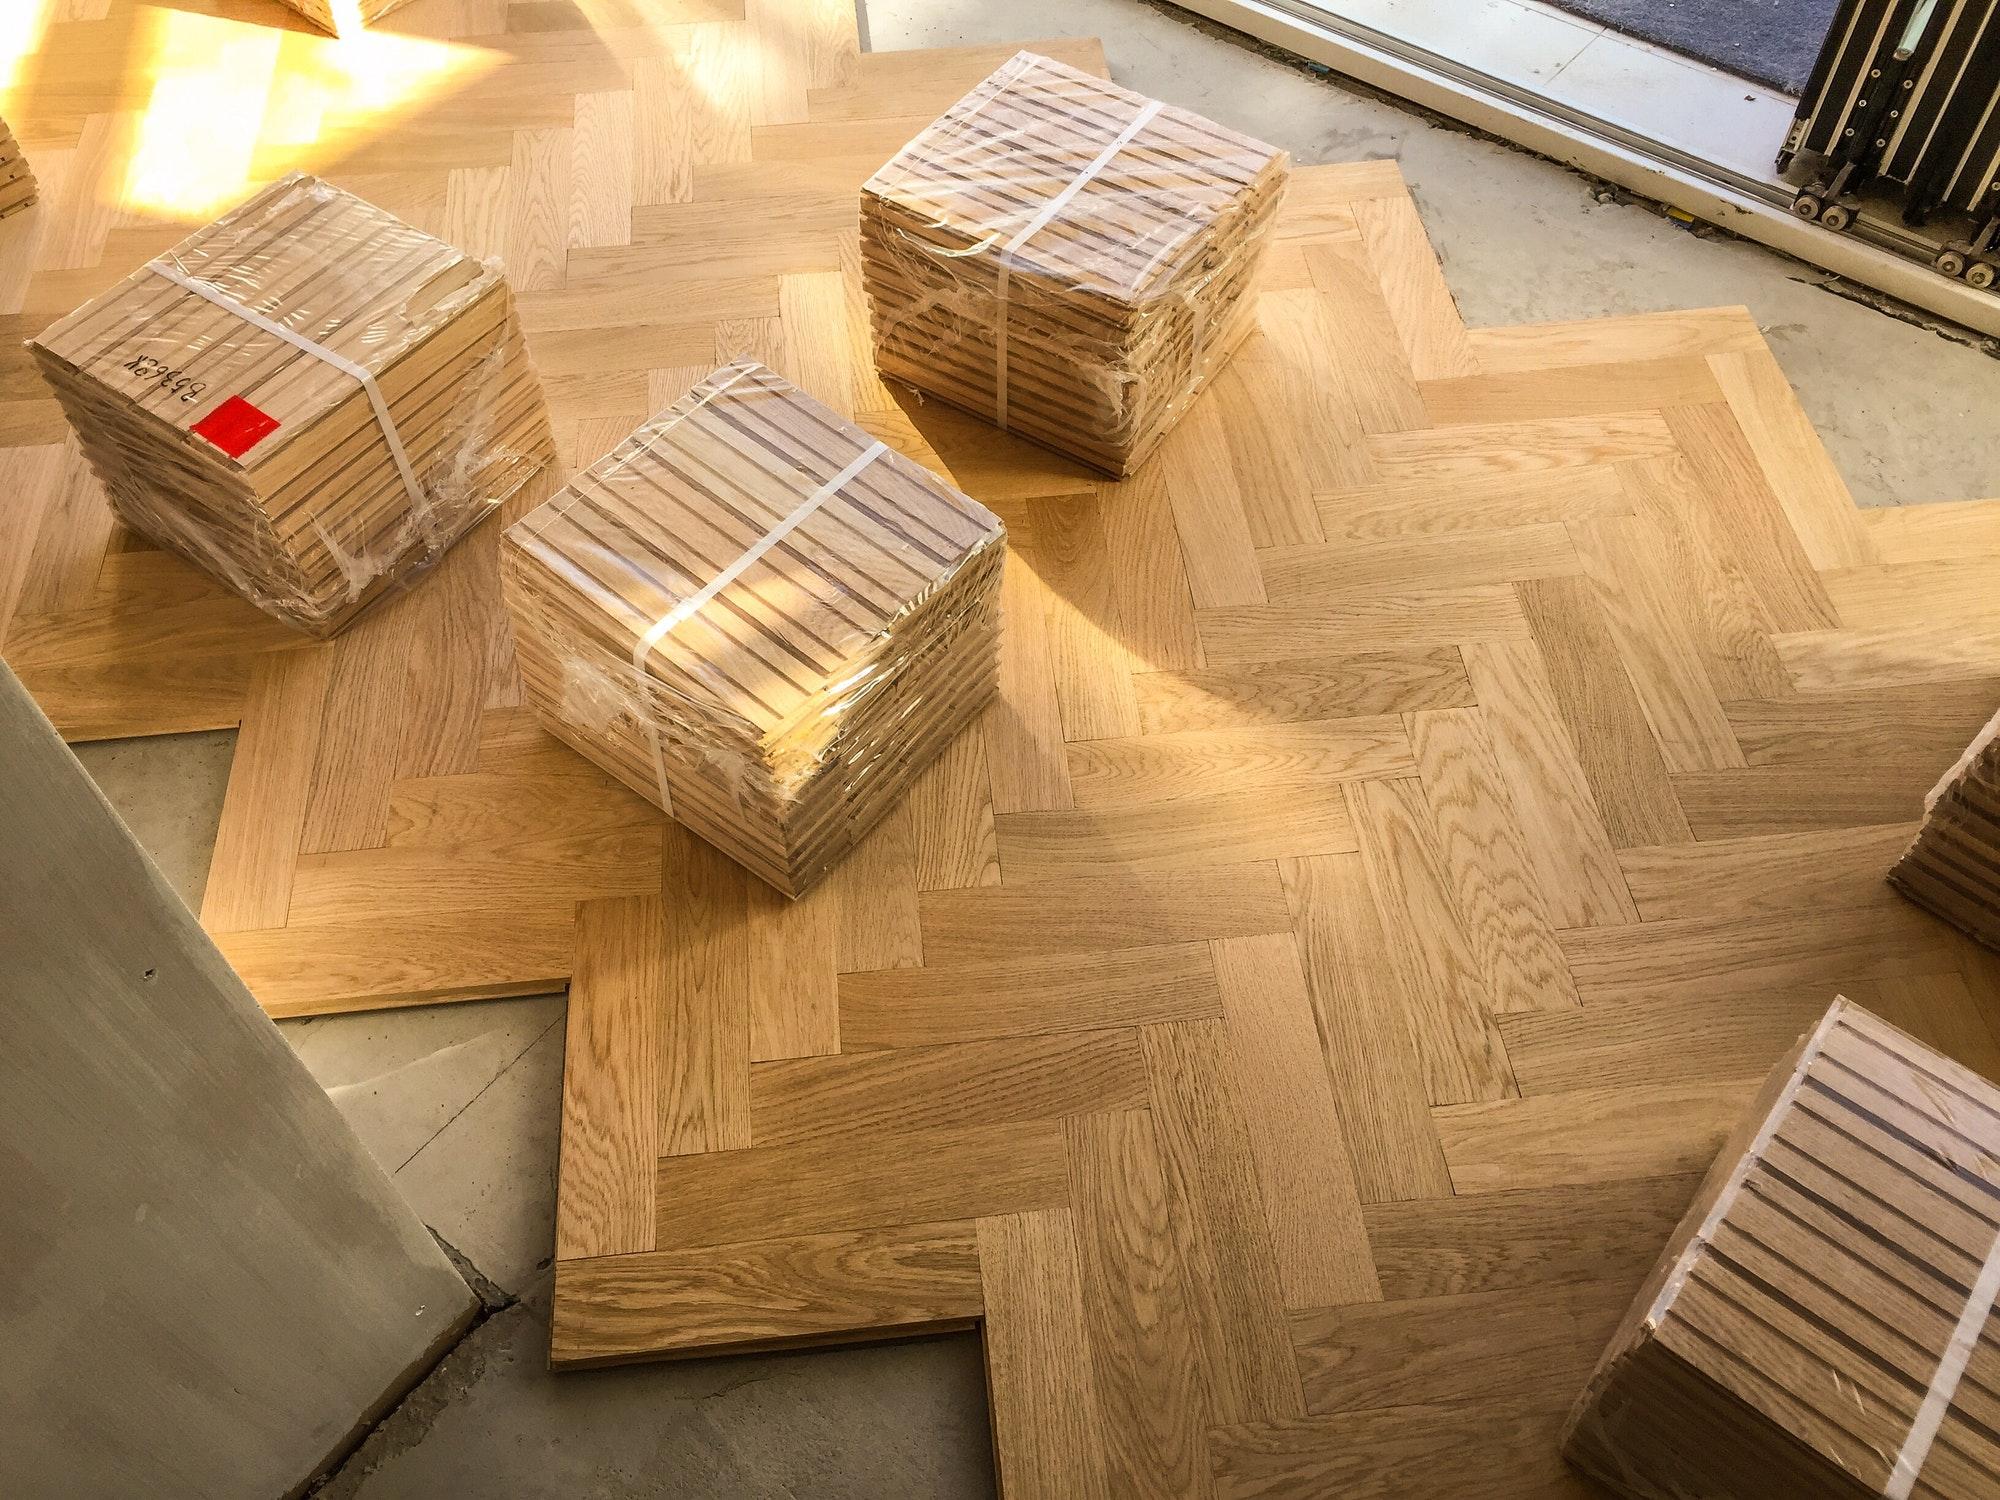 Packs of wooden parquet flooring are seen during installation of wood herringbone kitchen floor